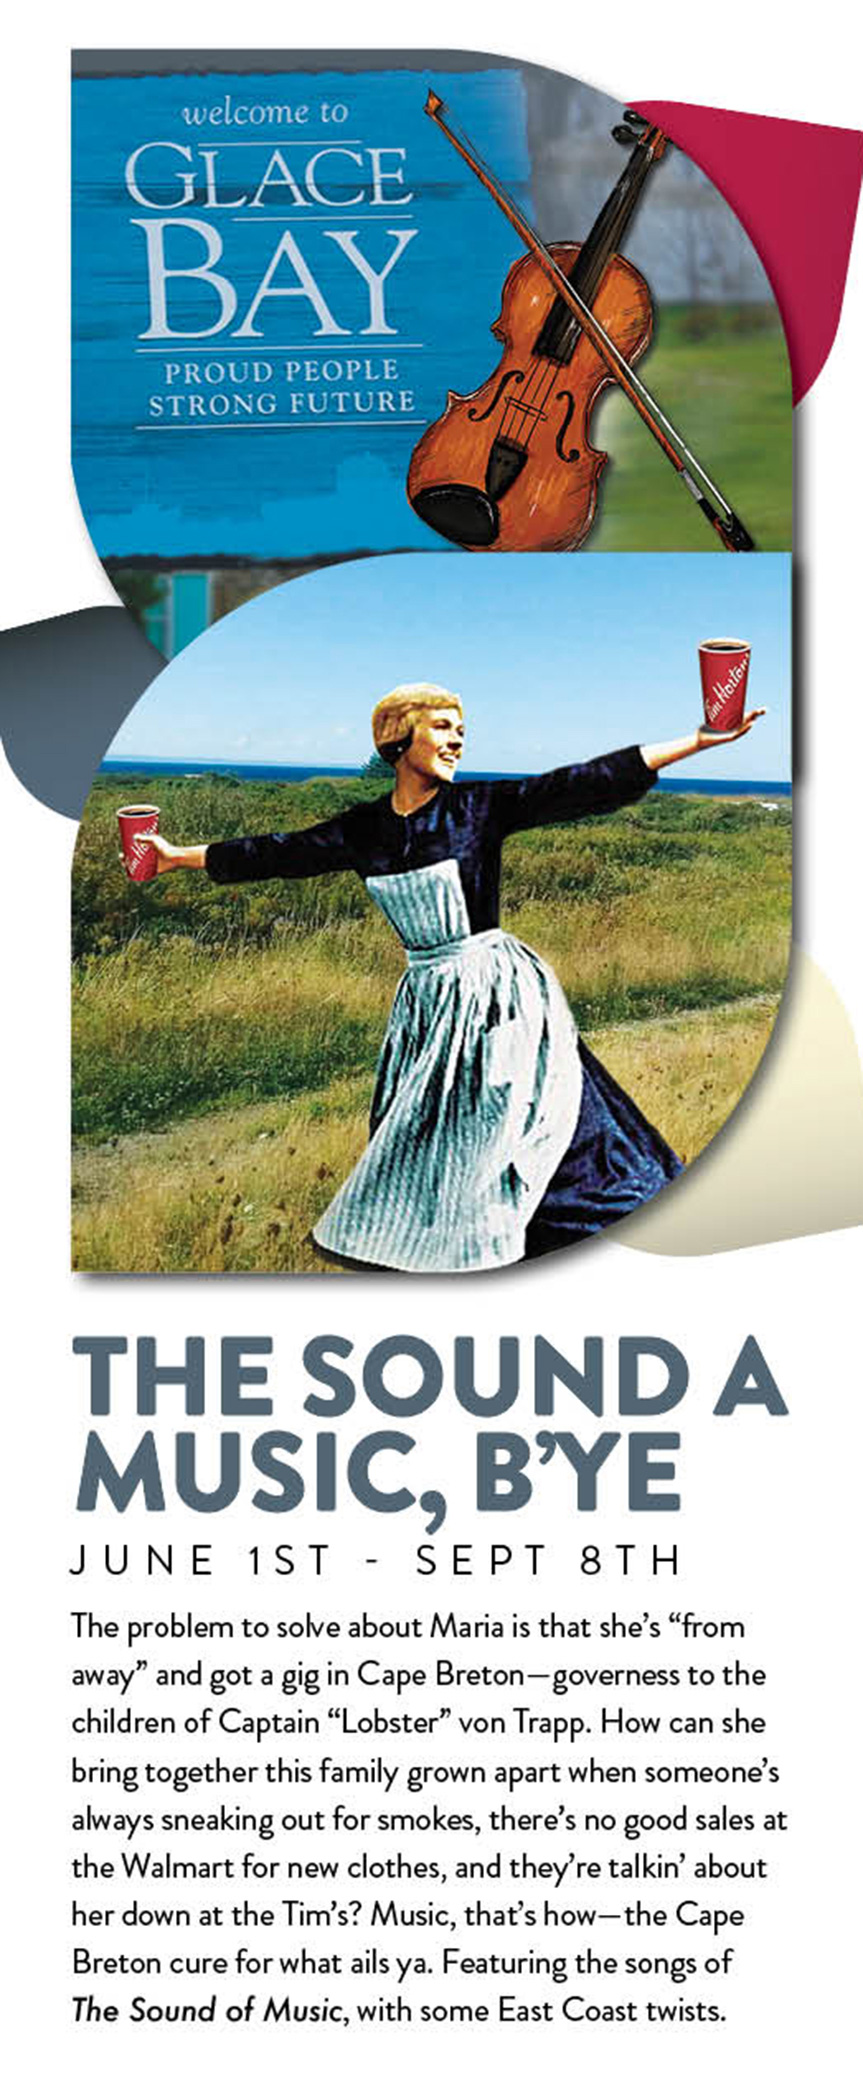 The Sound of Music, B'ye